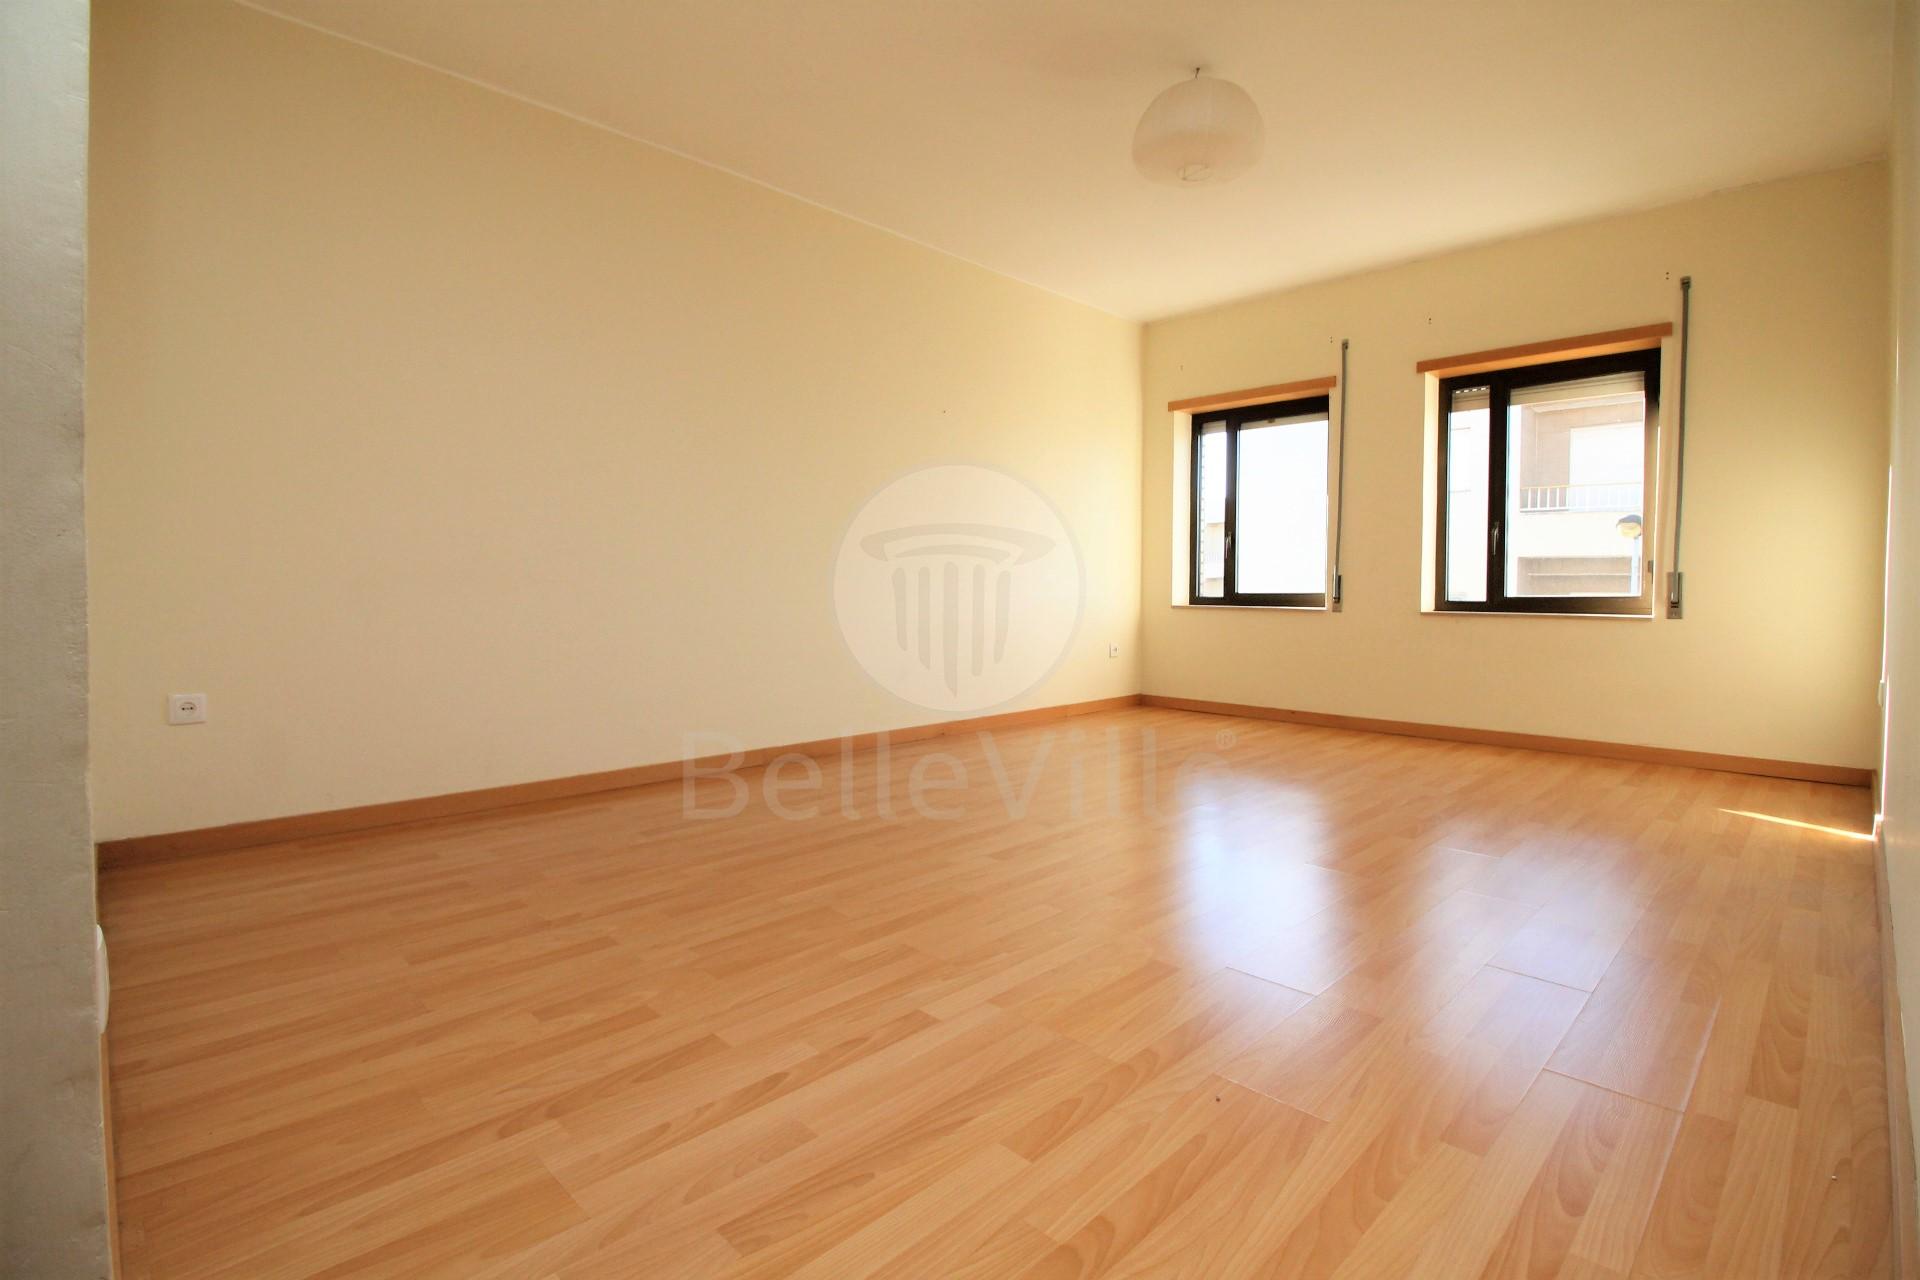 Apartamento T1, Braga, Maximinos,